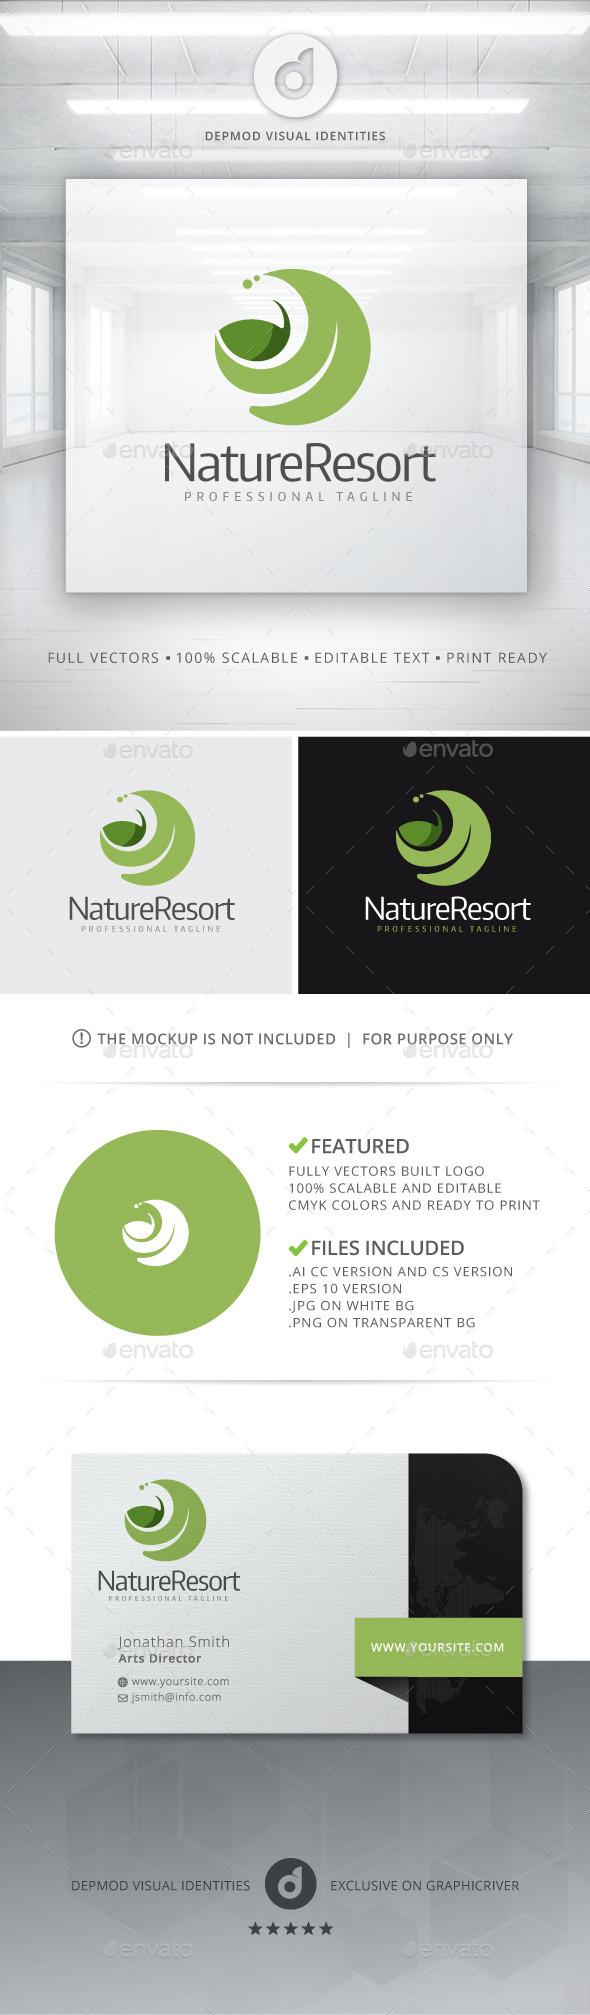 GraphicRiver Nature Resort Logo 10916790